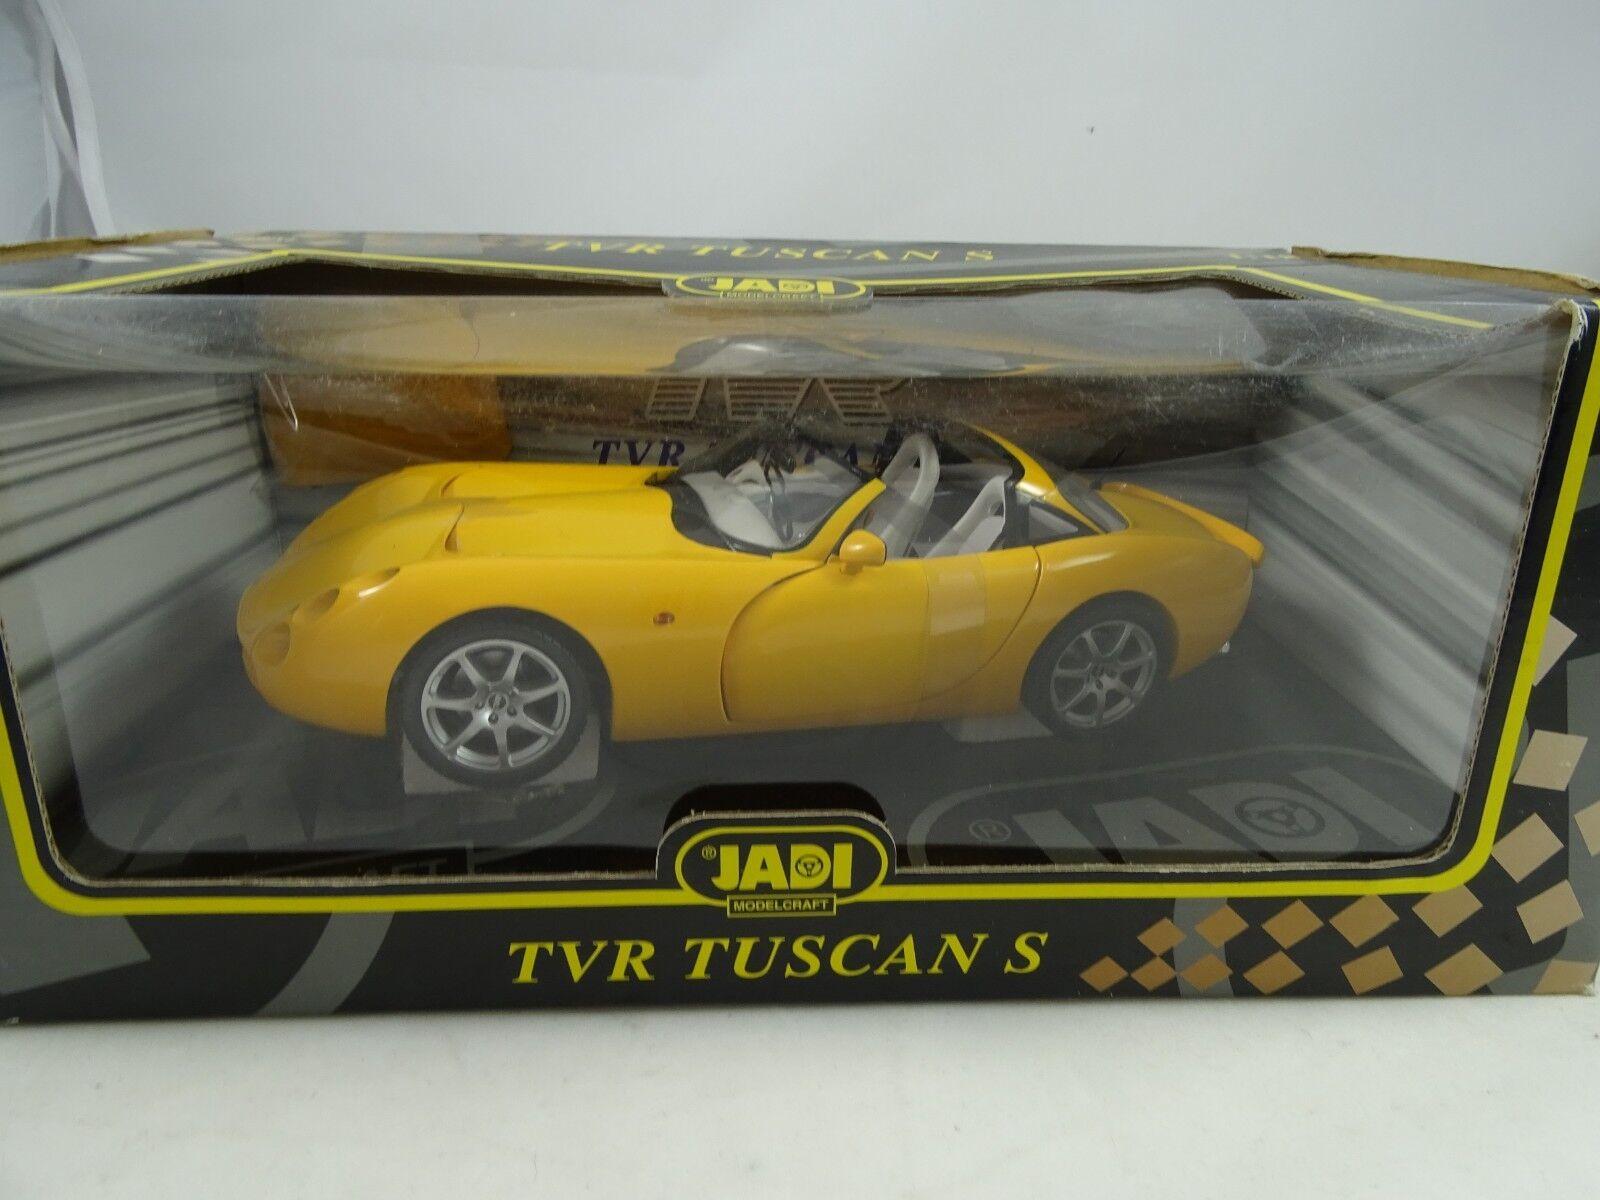 1 18 Jadi  jm98052 TVR Tuscan S SUNSET jaune-RARE NOUVEAU Neuf dans sa boîte